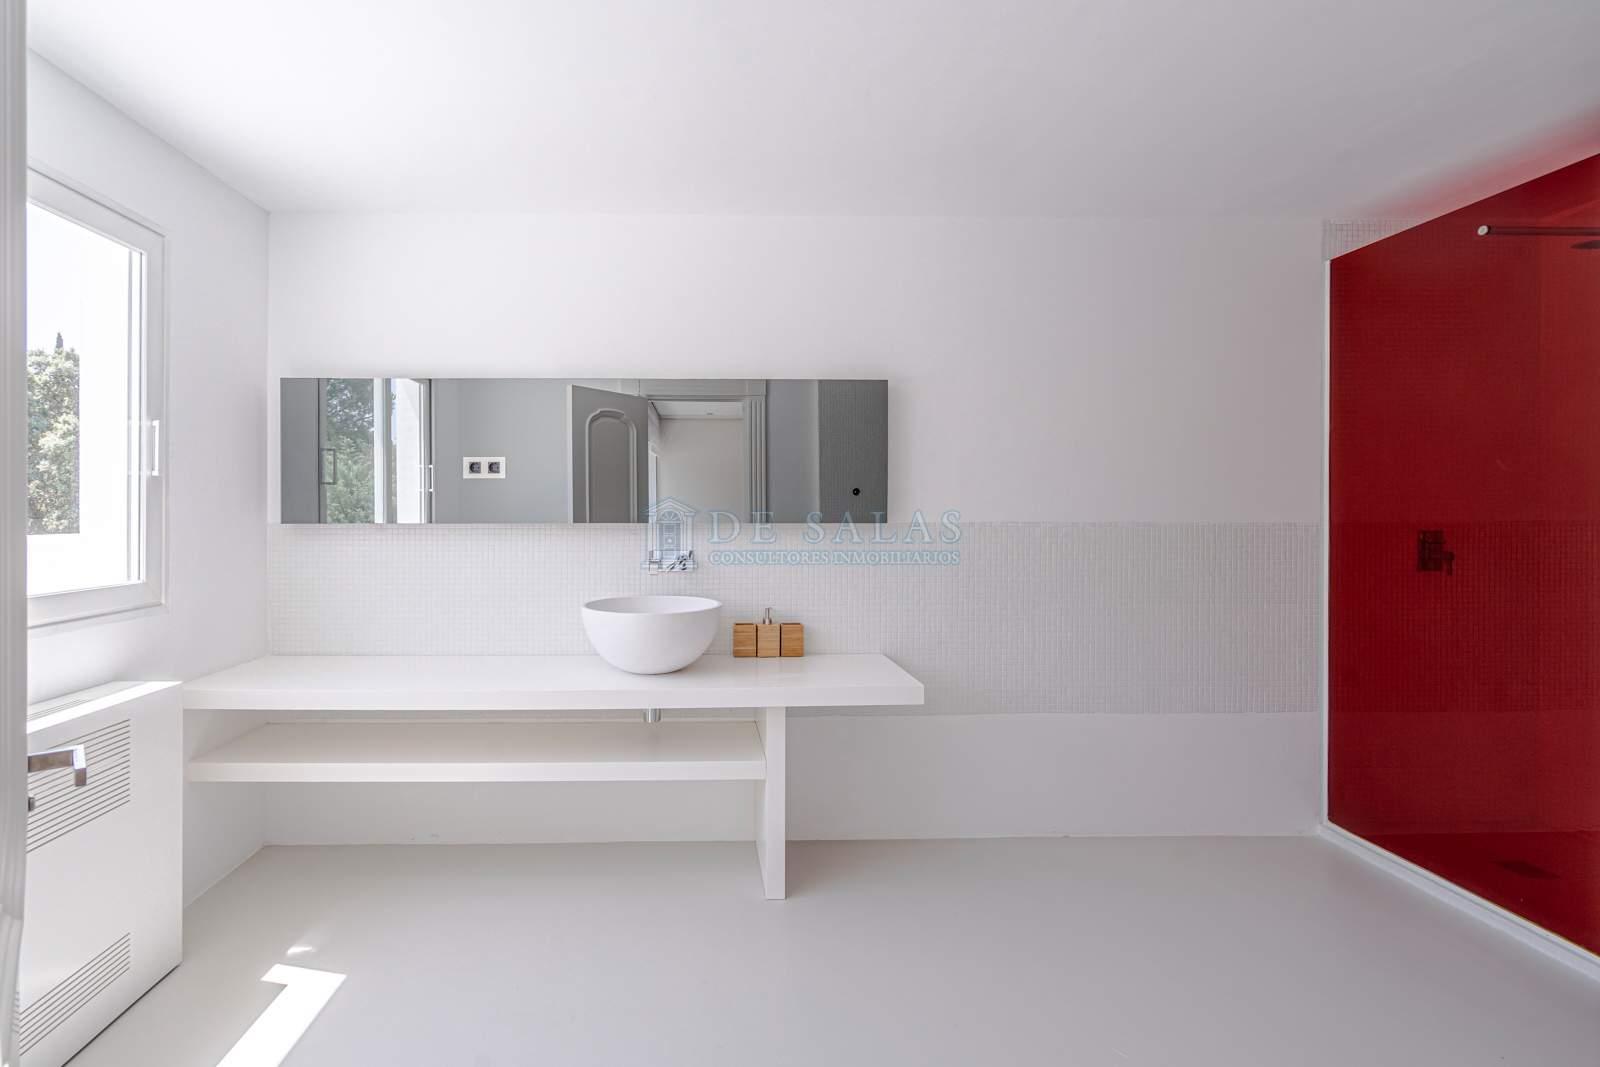 Baño-0027 House La Moraleja